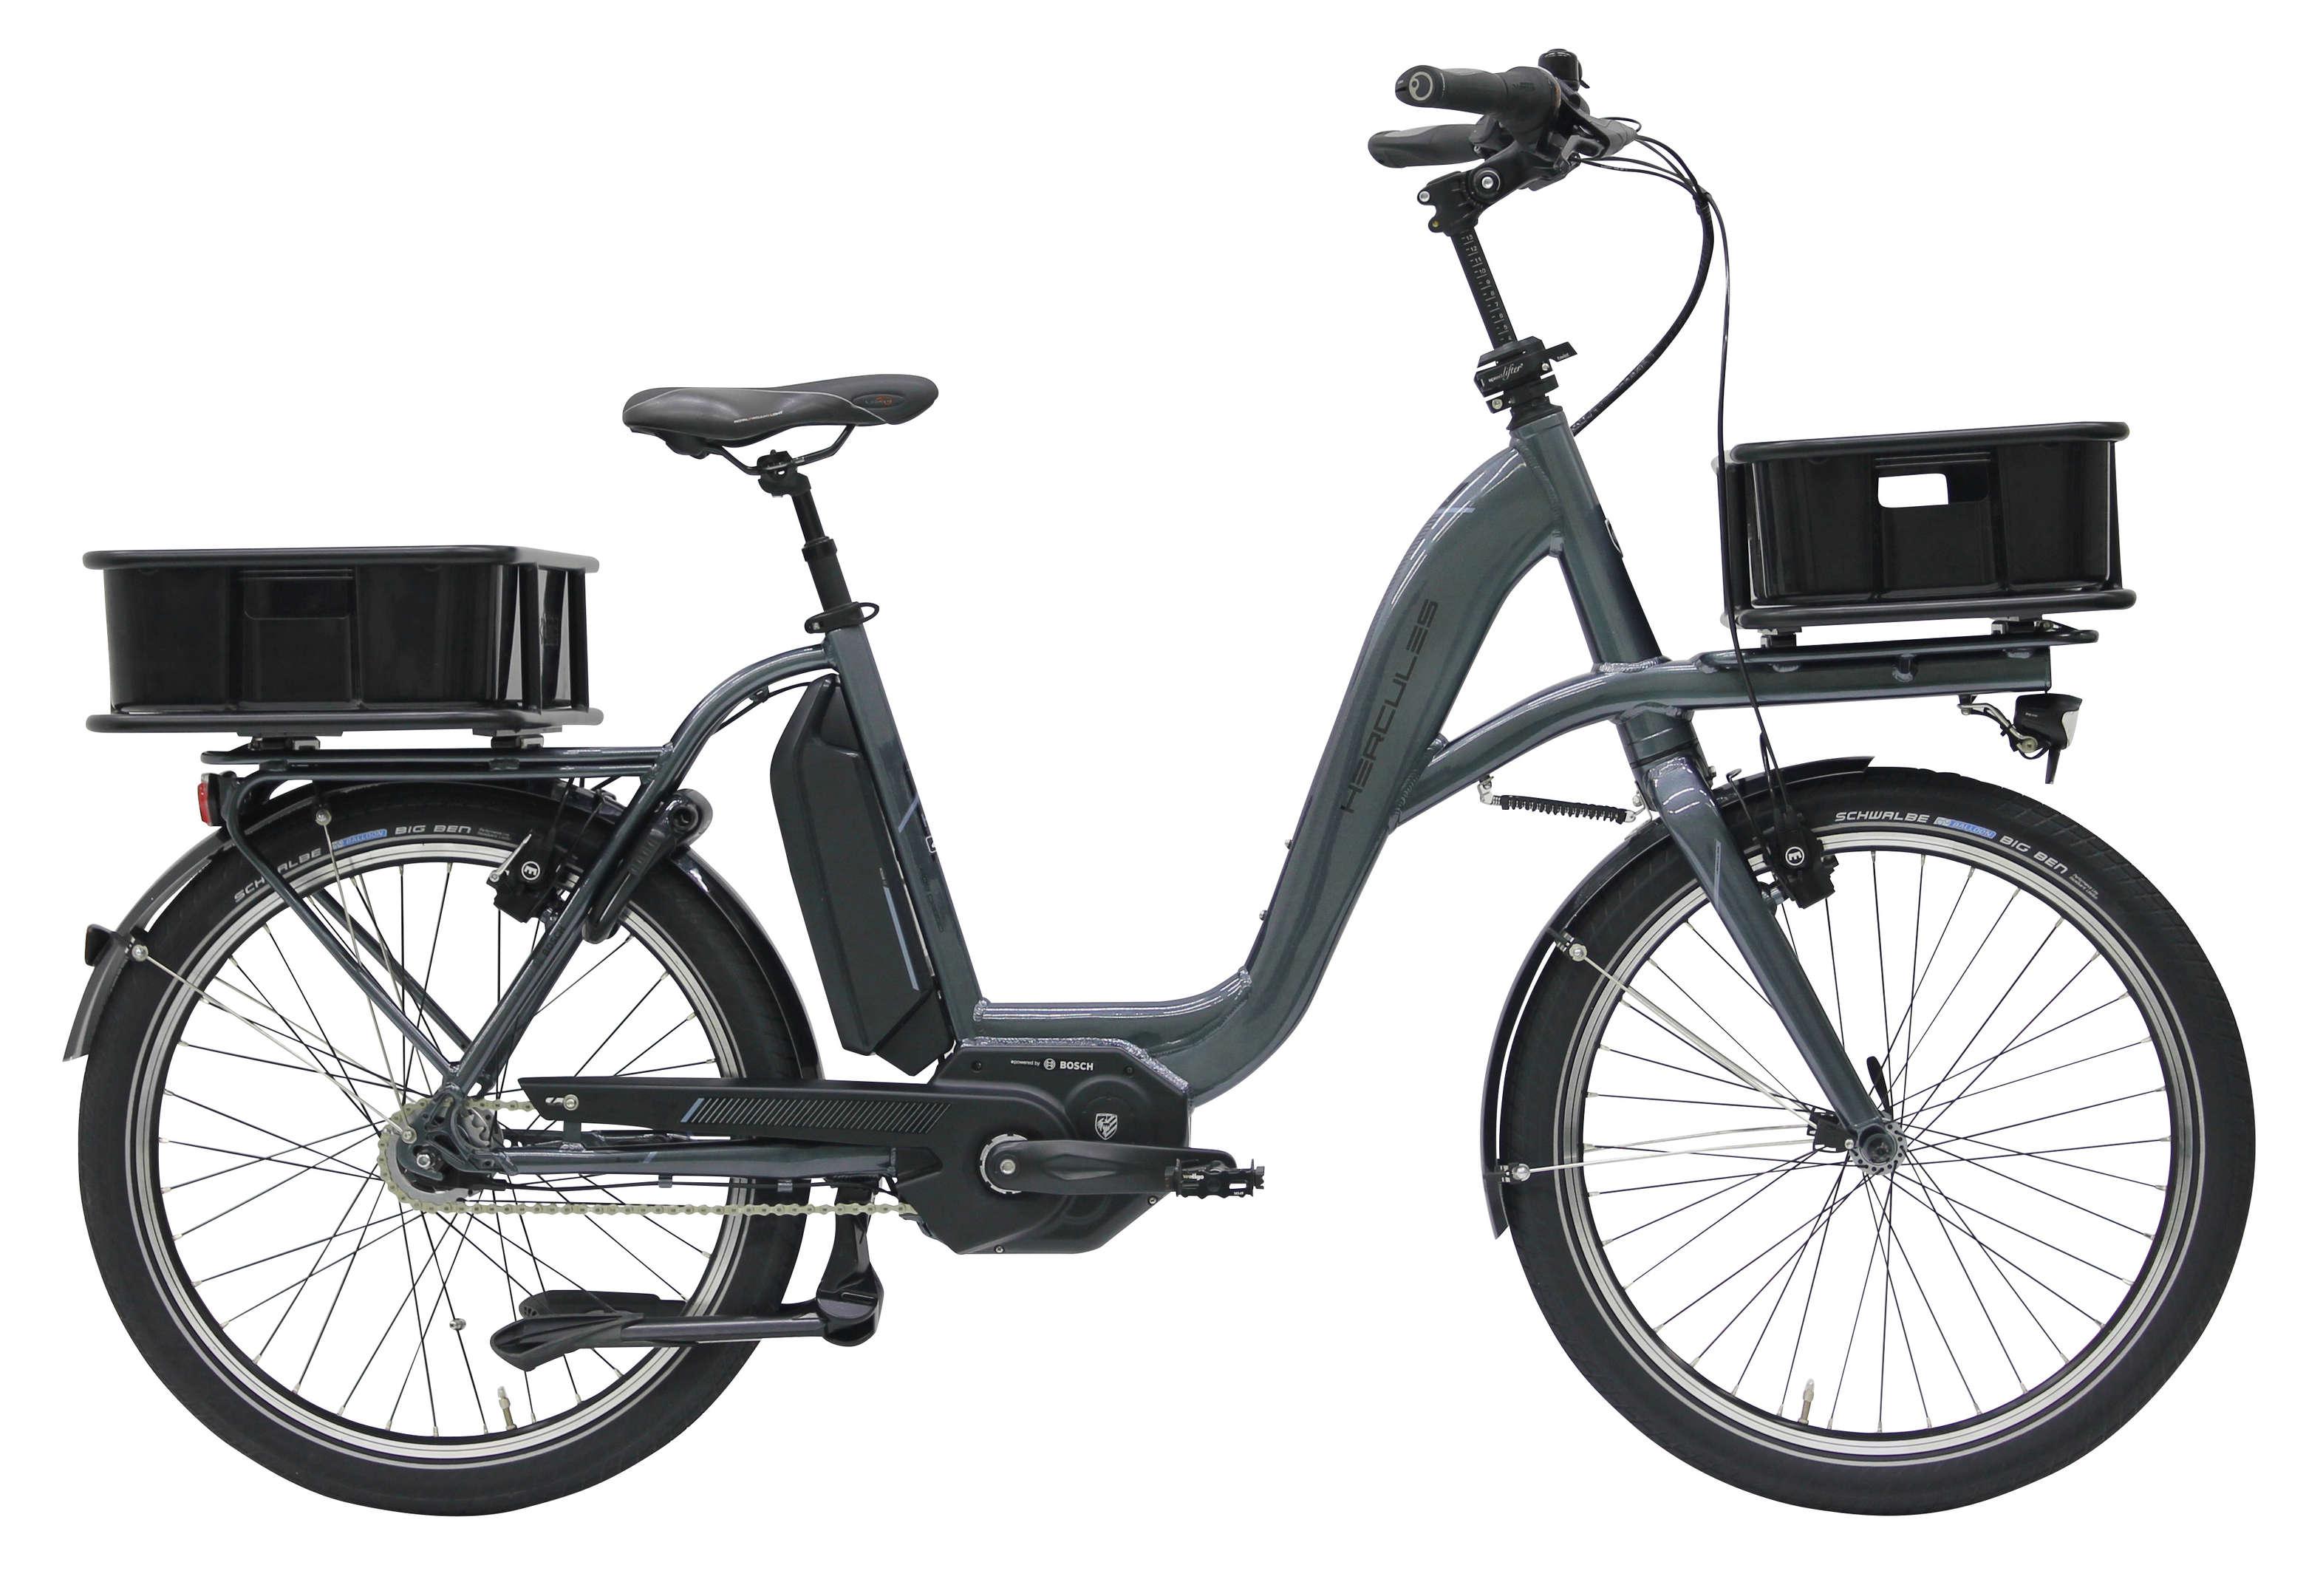 hercules e bike rob cargo eurorad bikeleasingeurorad bikeleasing. Black Bedroom Furniture Sets. Home Design Ideas